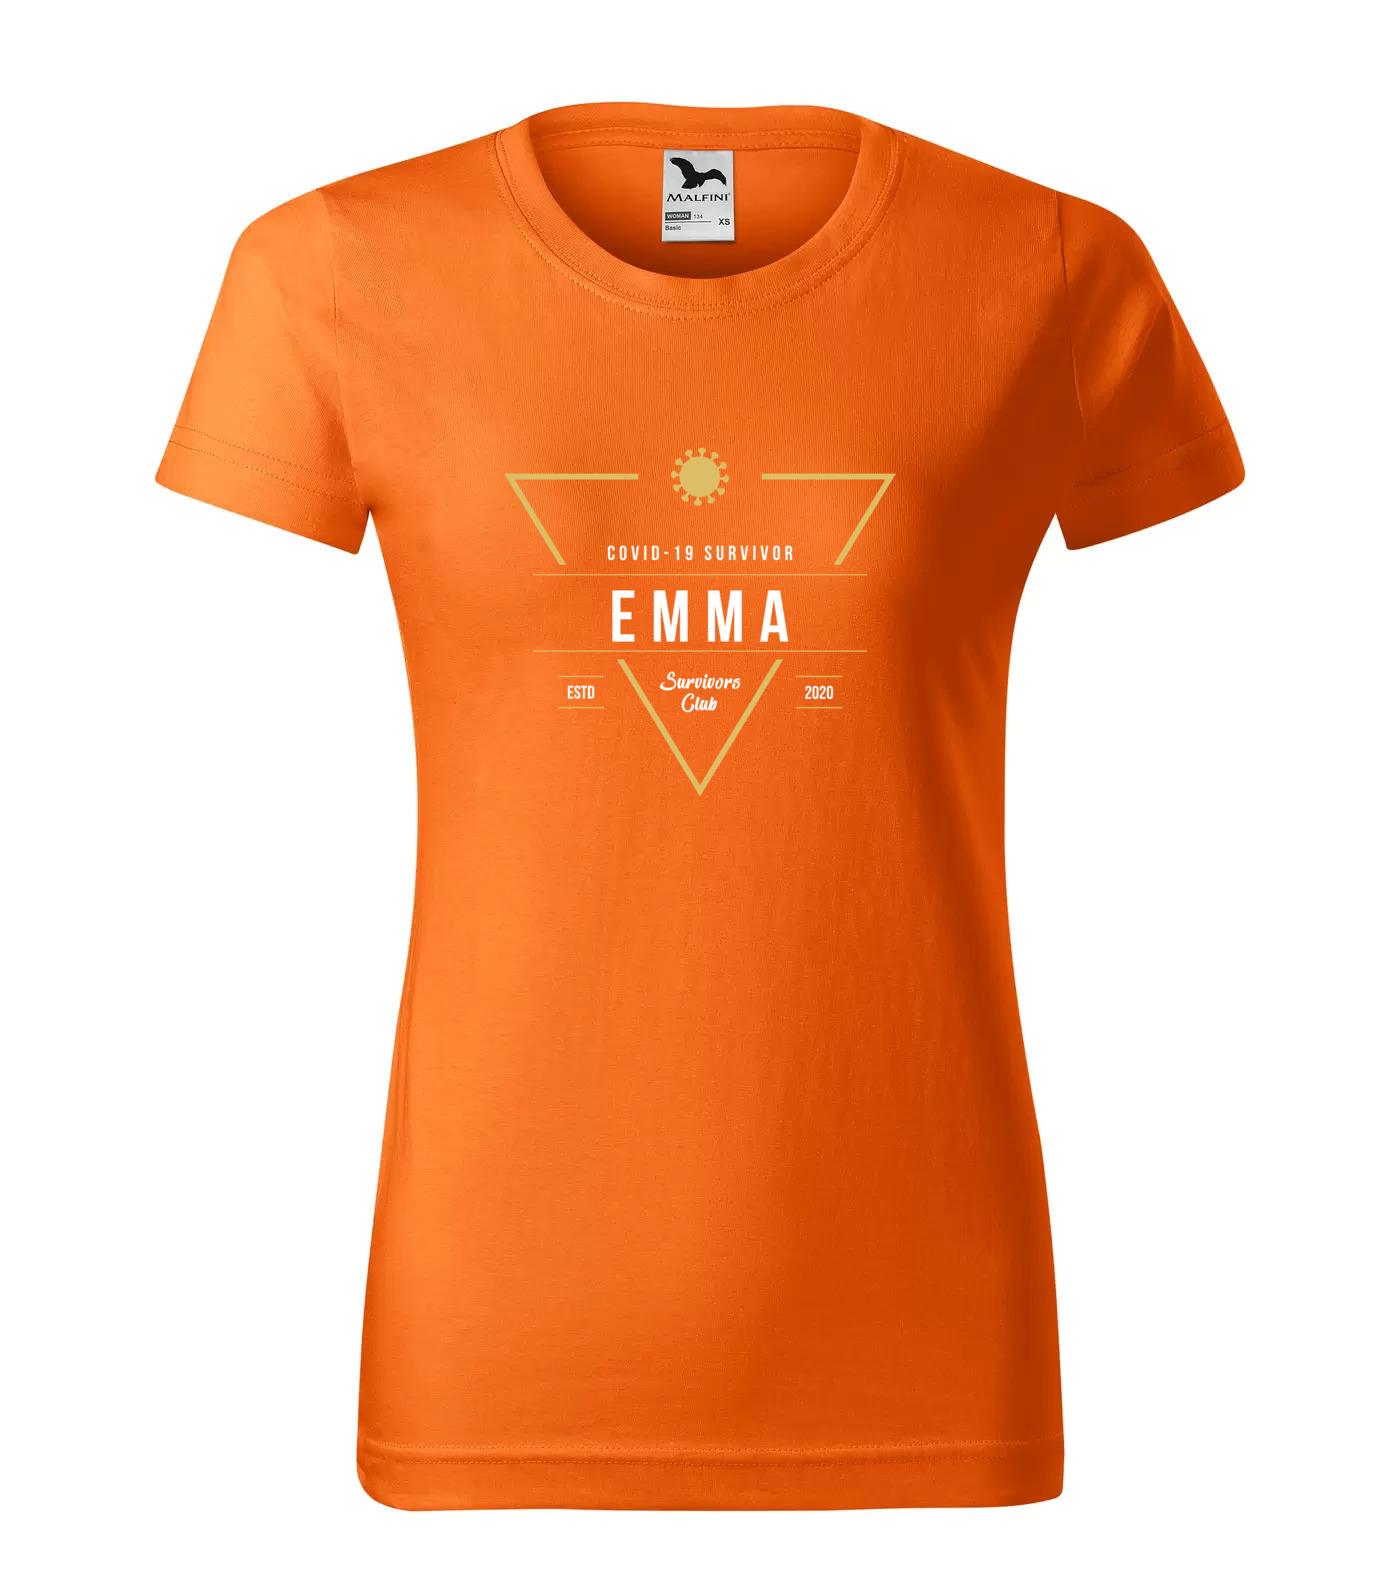 Tričko Survivor Club Emma